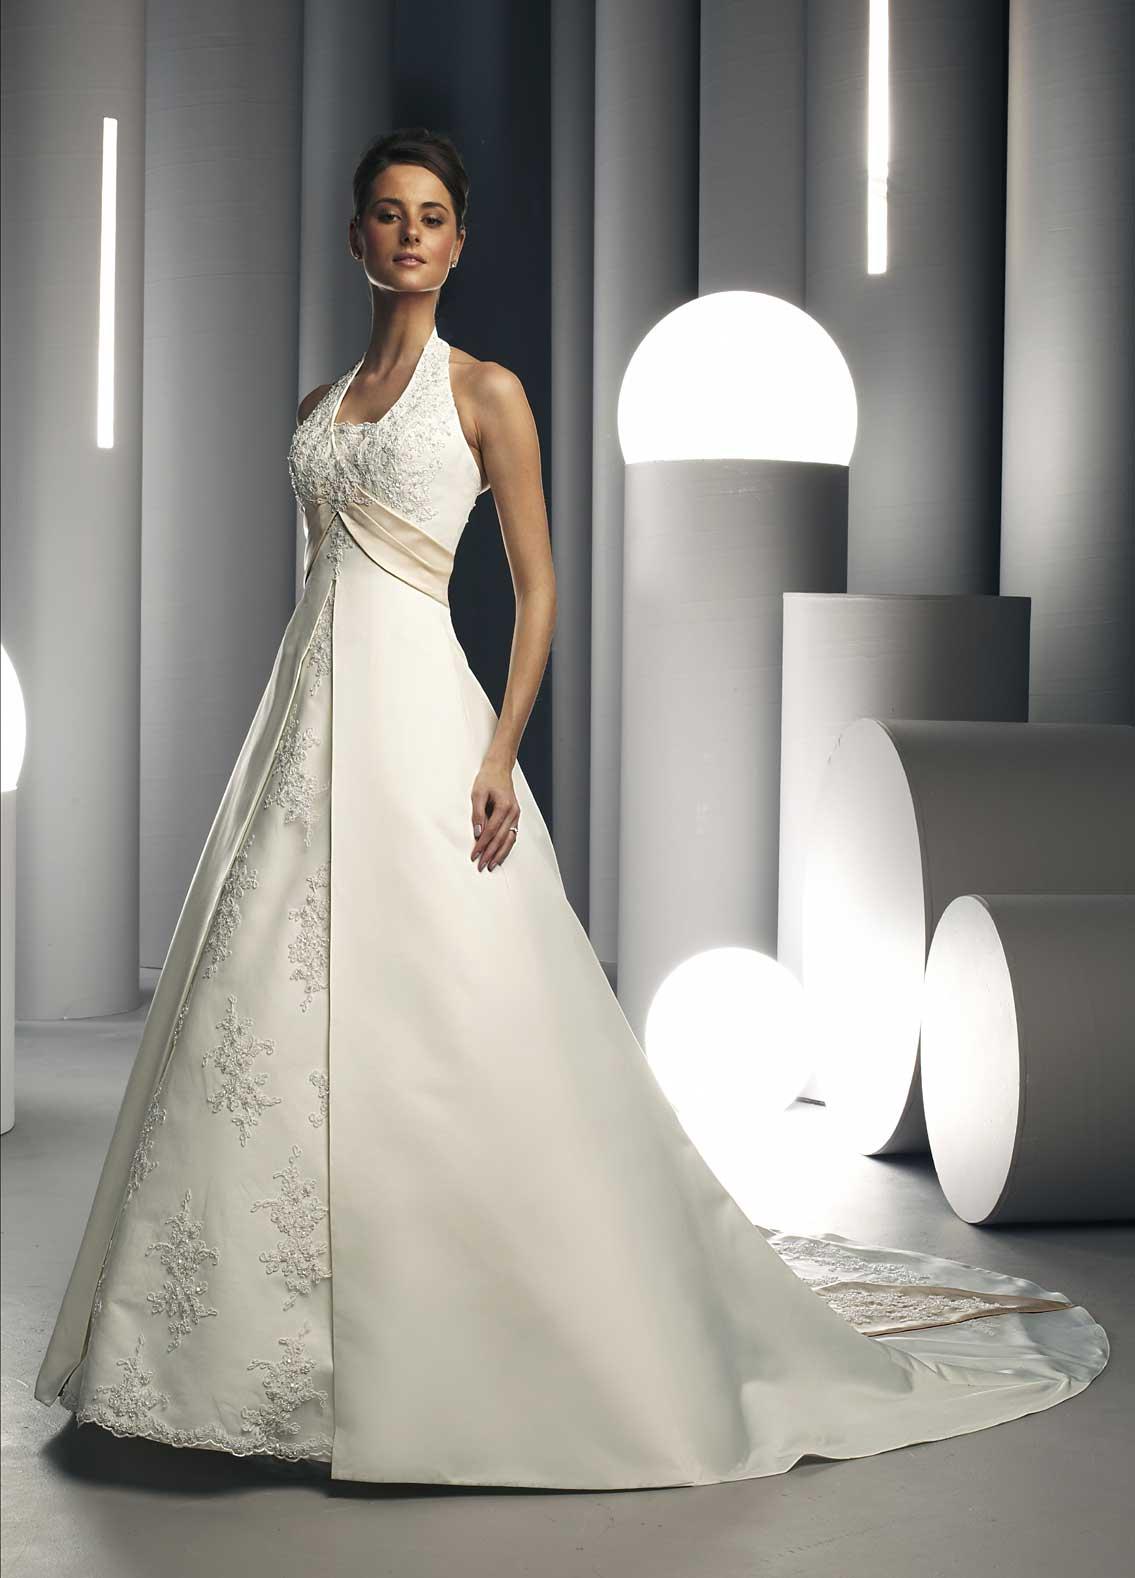 Plus Size Indian Wedding Dress Best Ideas Bridal Saree 2019